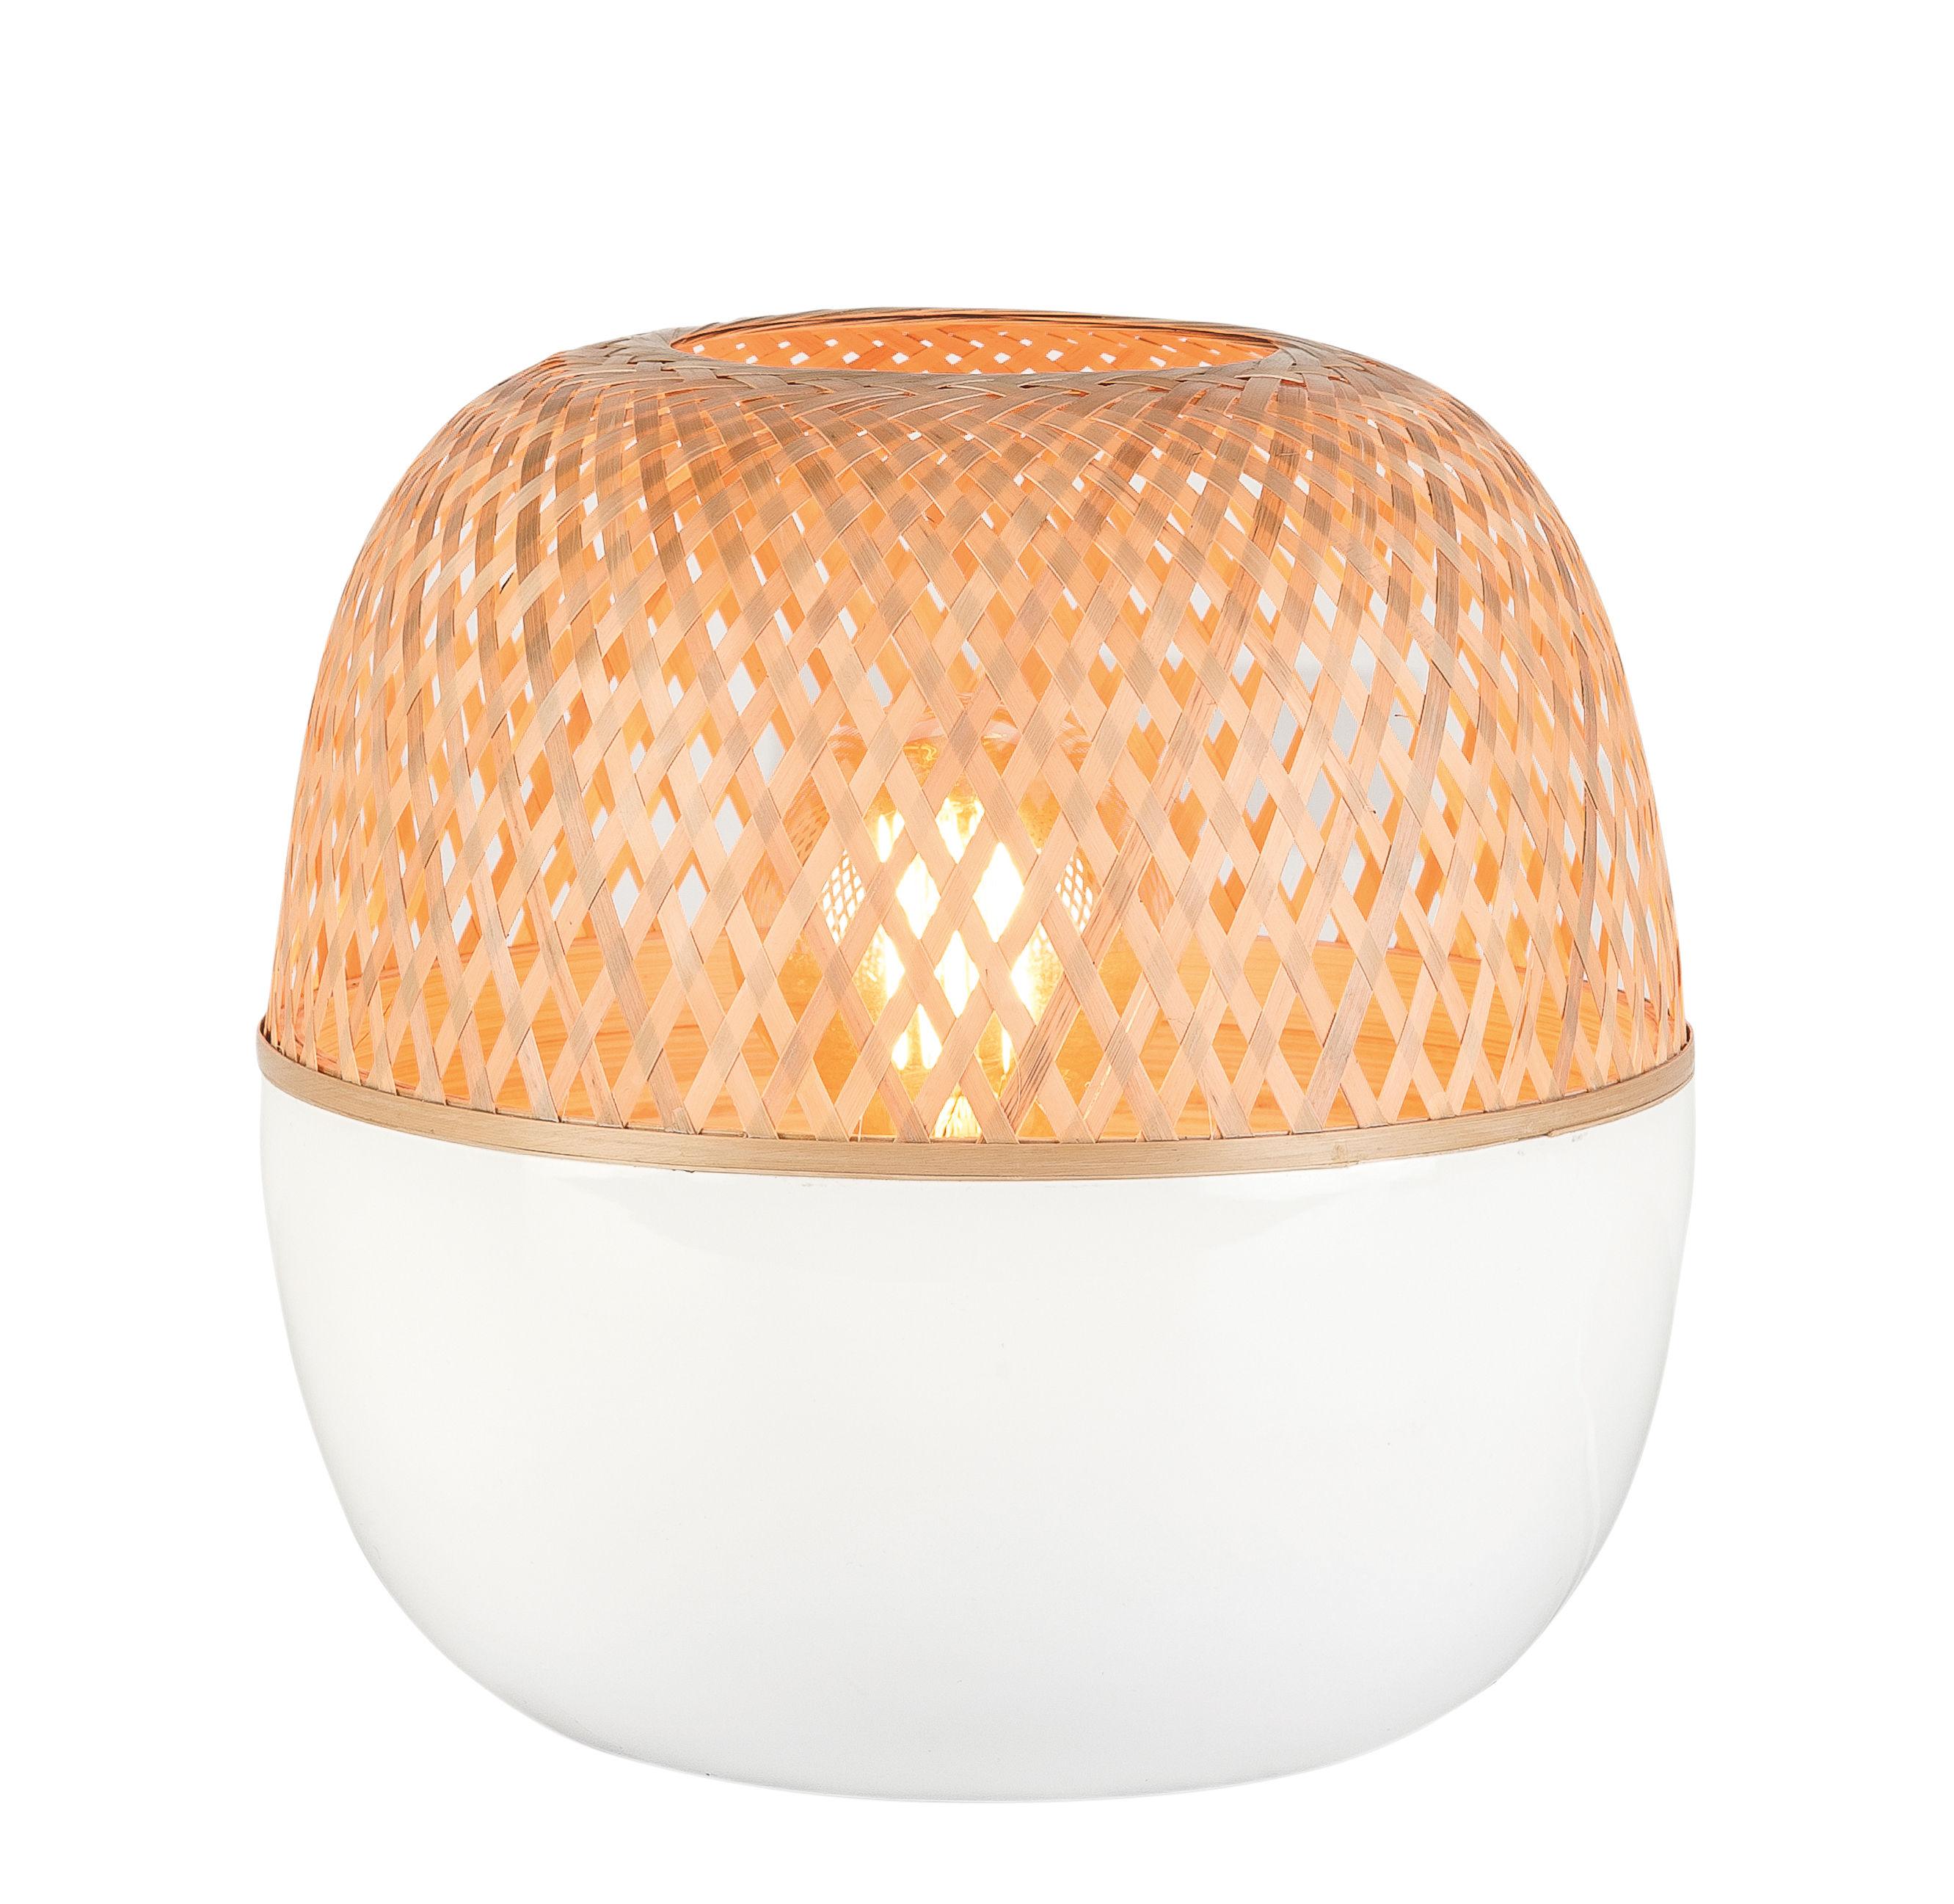 Illuminazione - Lampade da tavolo - Lampada da tavolo Mekong - / Bambù - Ø 30 x H 33 cm di GOOD&MOJO - Bambù & bianco - Bambou peint, Banbou naturel tressé